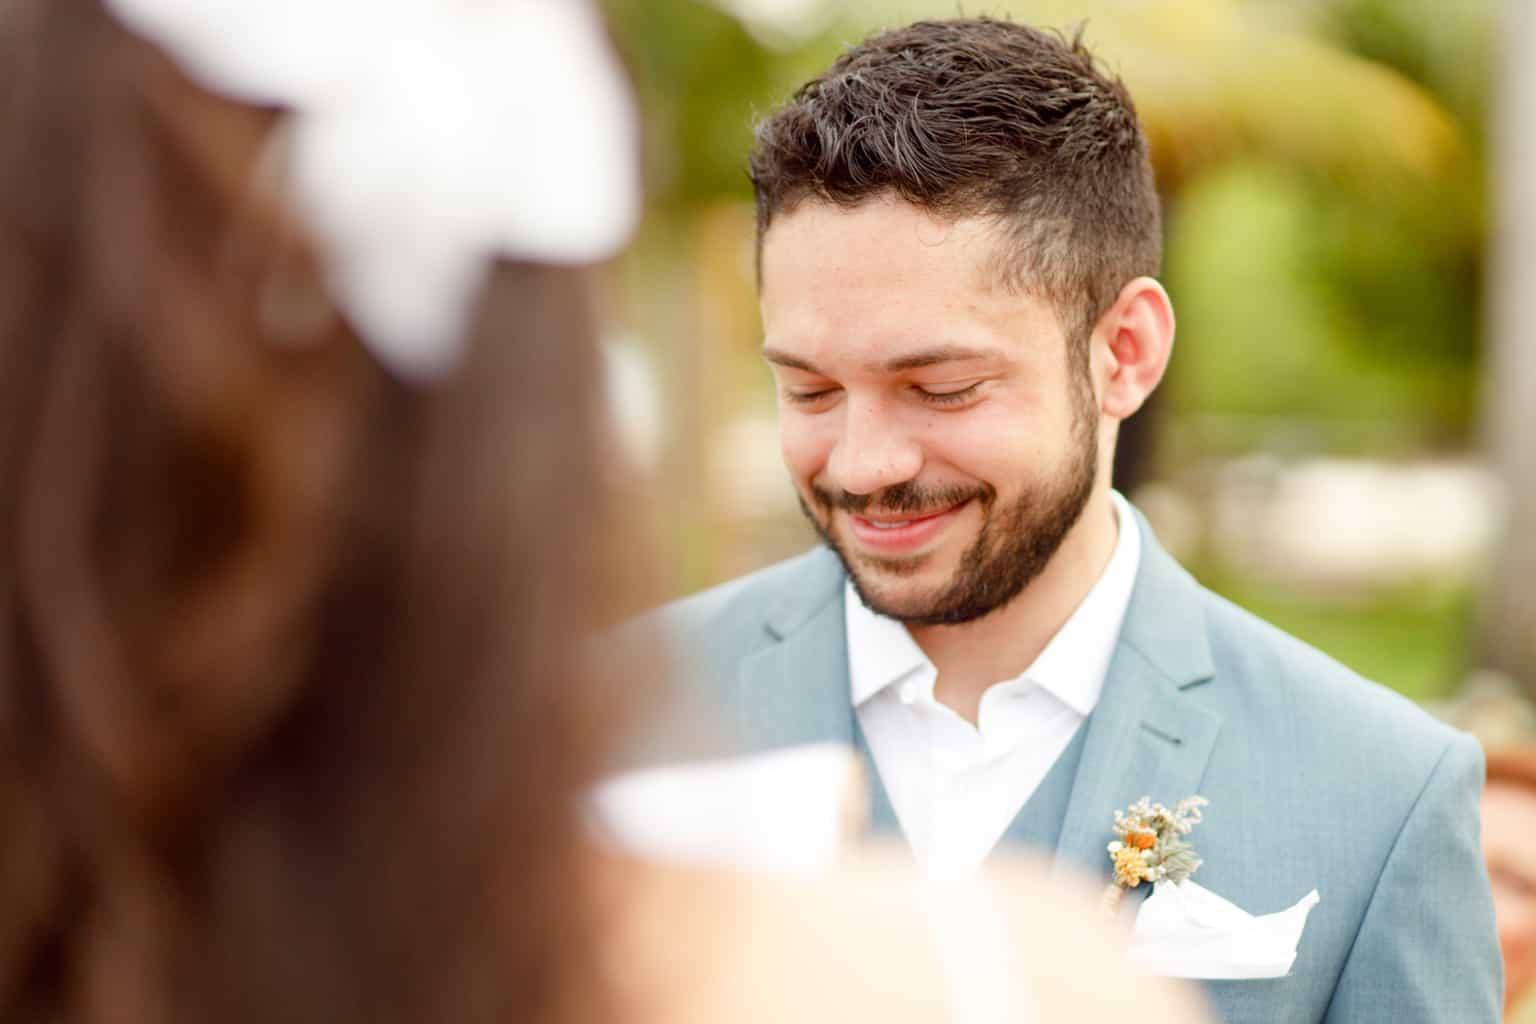 Casamento-Emanuelle-e-Alysson-Fotografia-Tadeu-Nanó-e-Luca-Antunes112